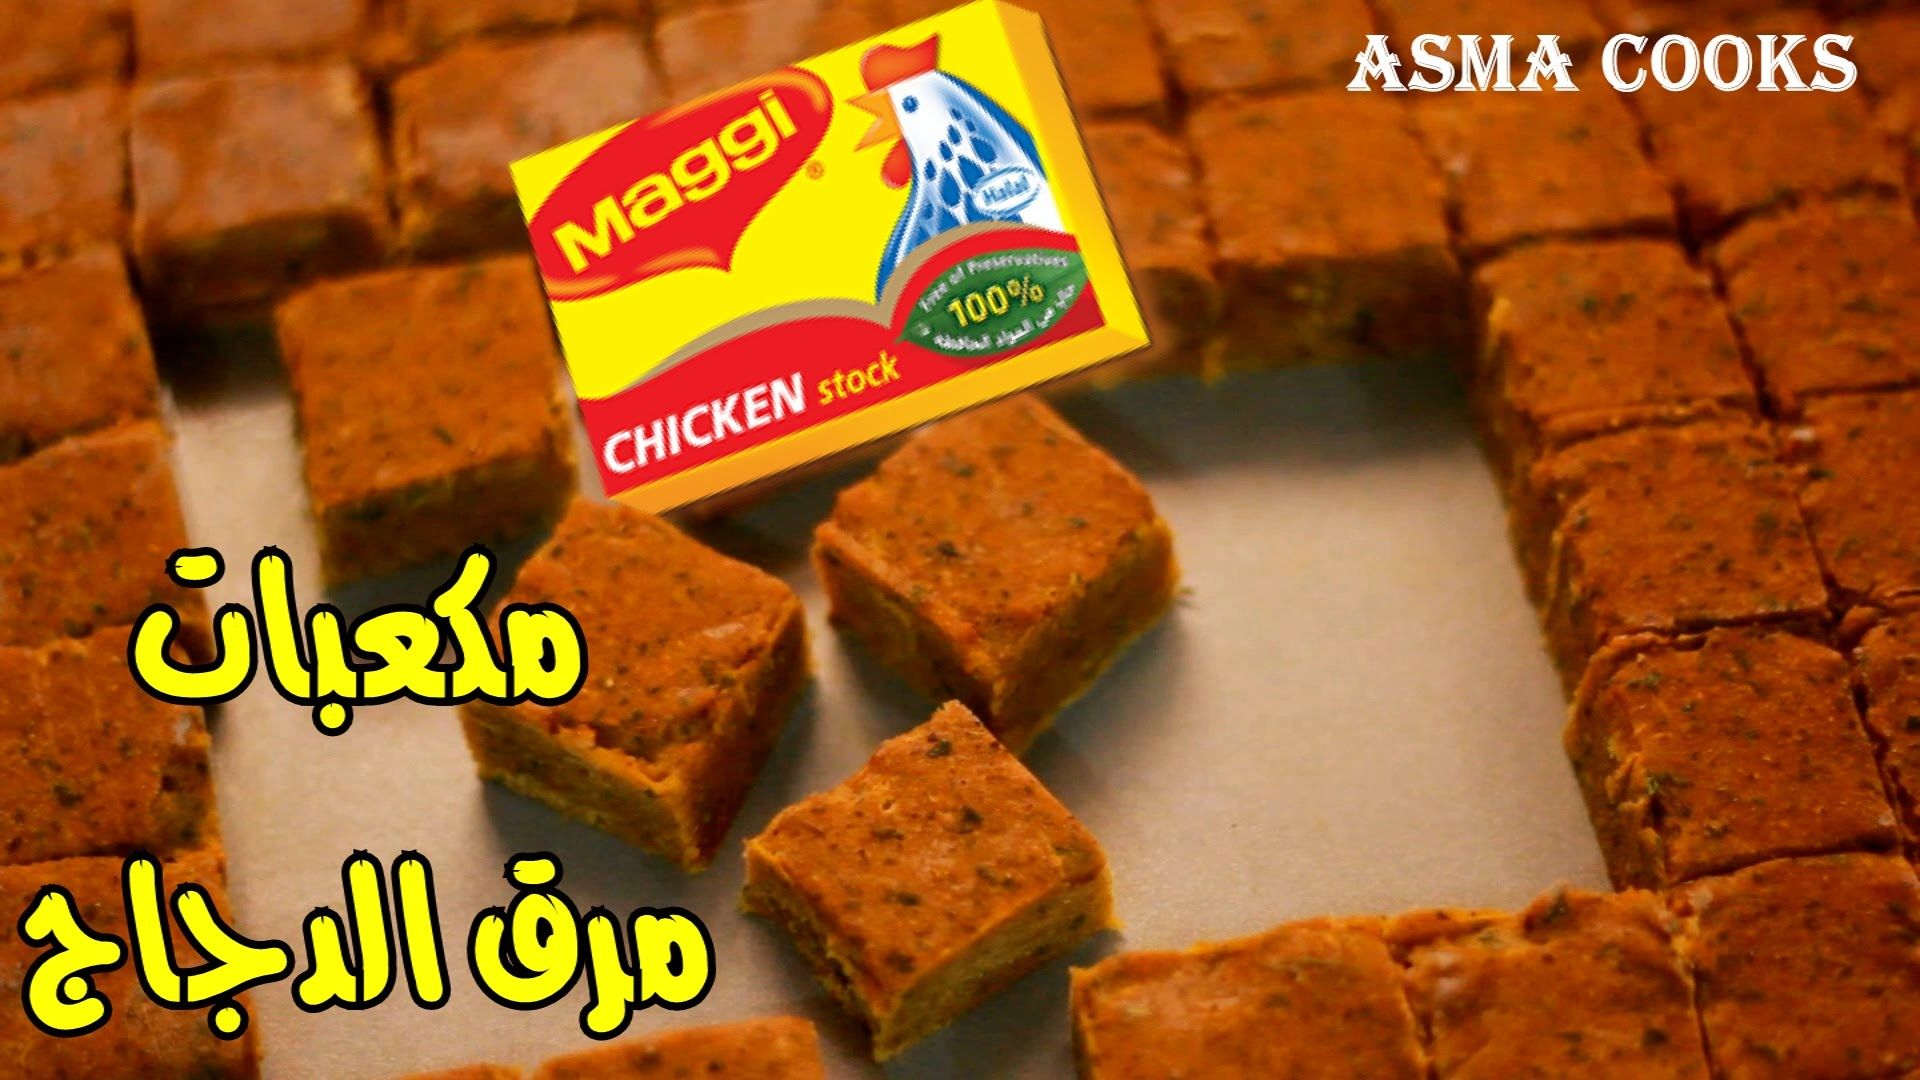 طريقة عمل مكعبات مرق الدجاج ماجي Asma Cooks Youtube Food Cooking Chicken Stock